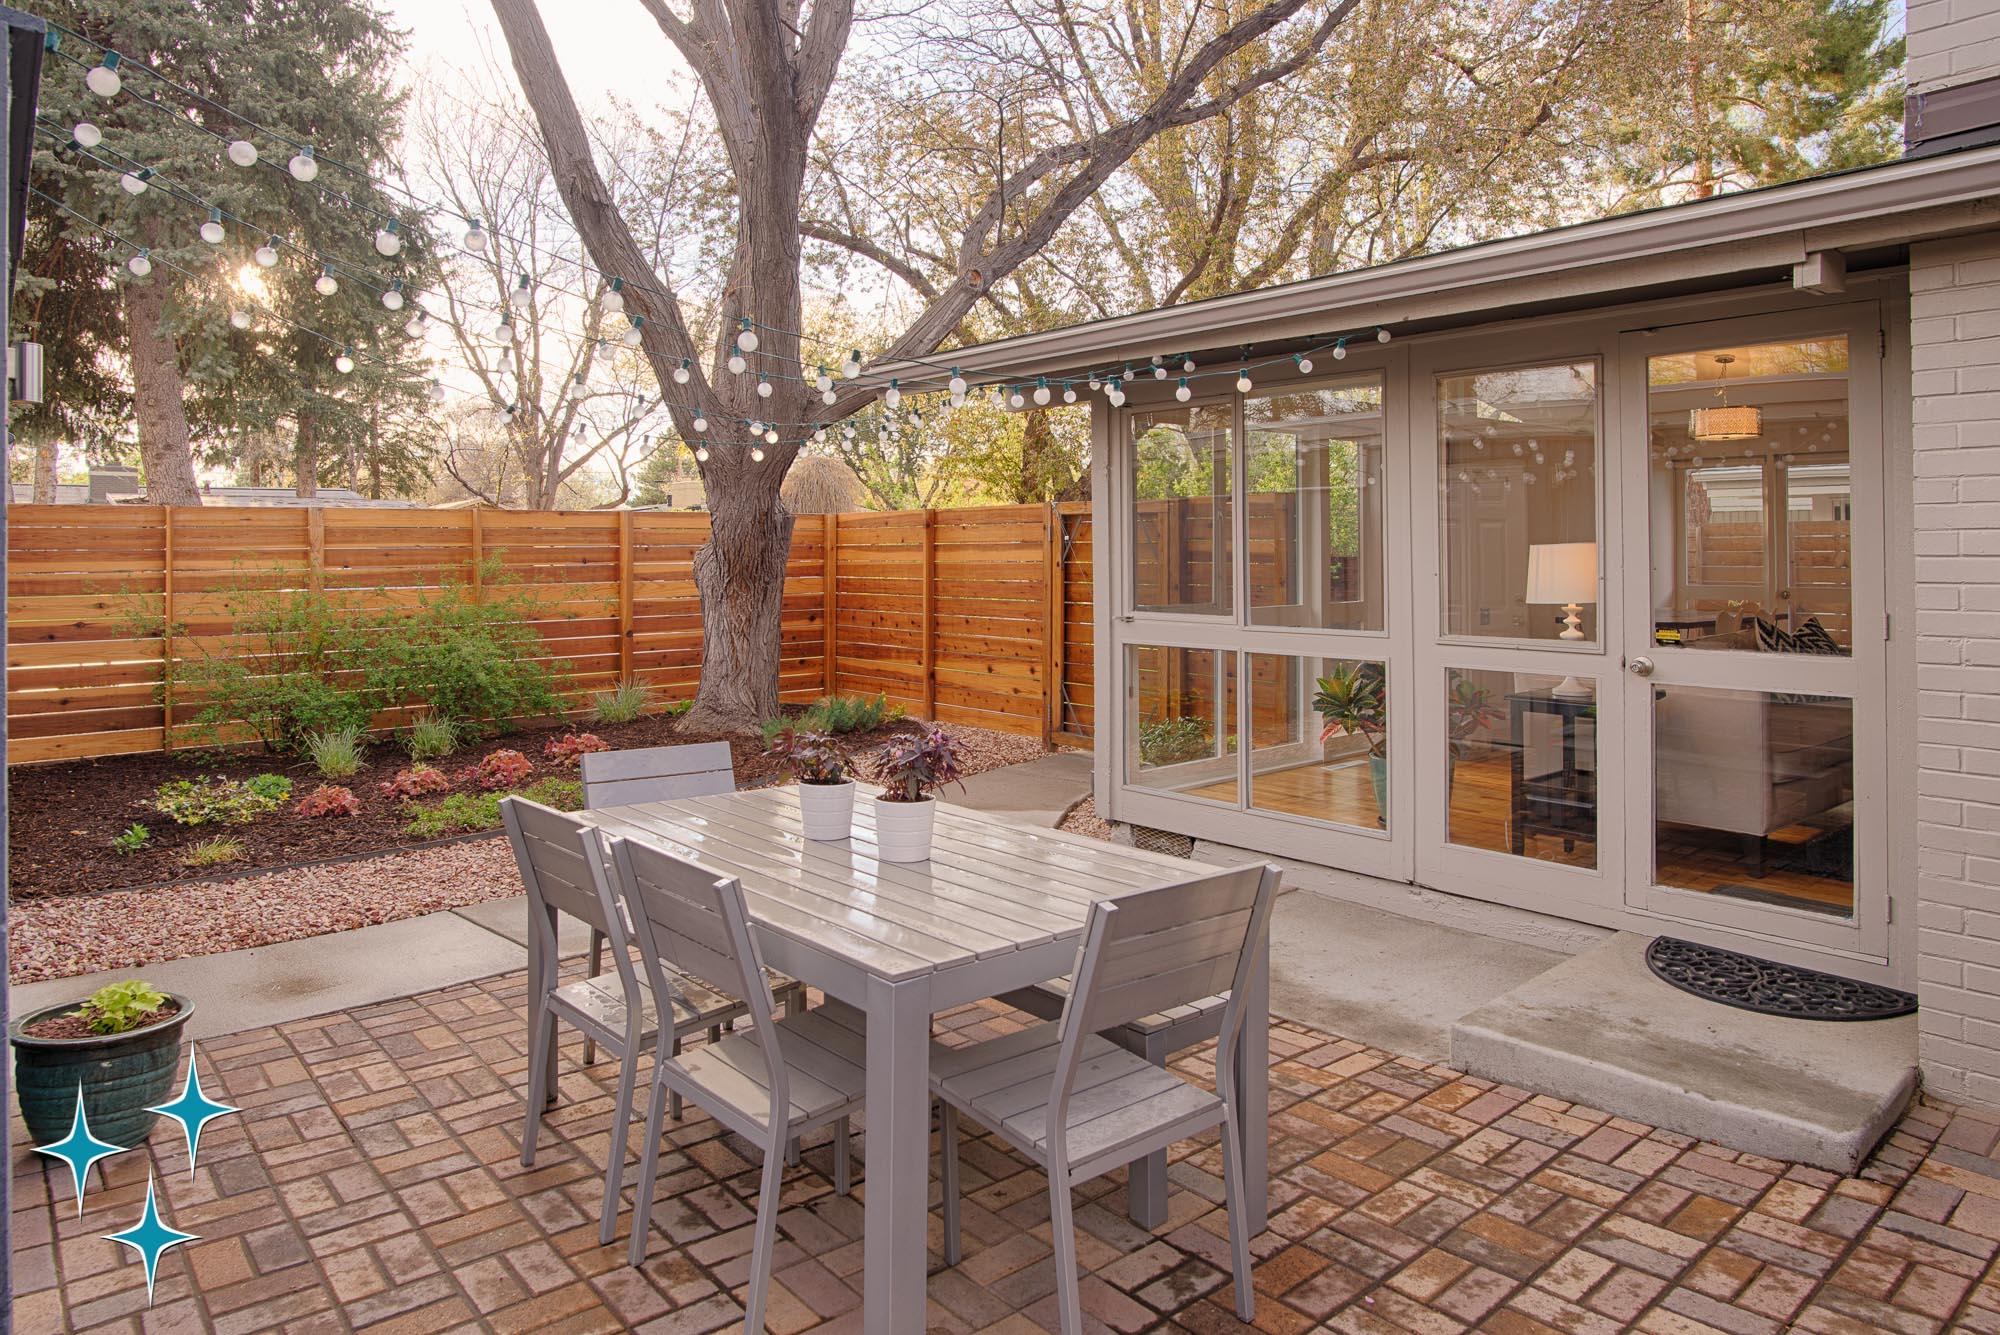 Adrian-Kinney-2560-S-Newton-Street-Denver-Cliff-May-Harvey-Park-2000w50-3SWM-17.jpg